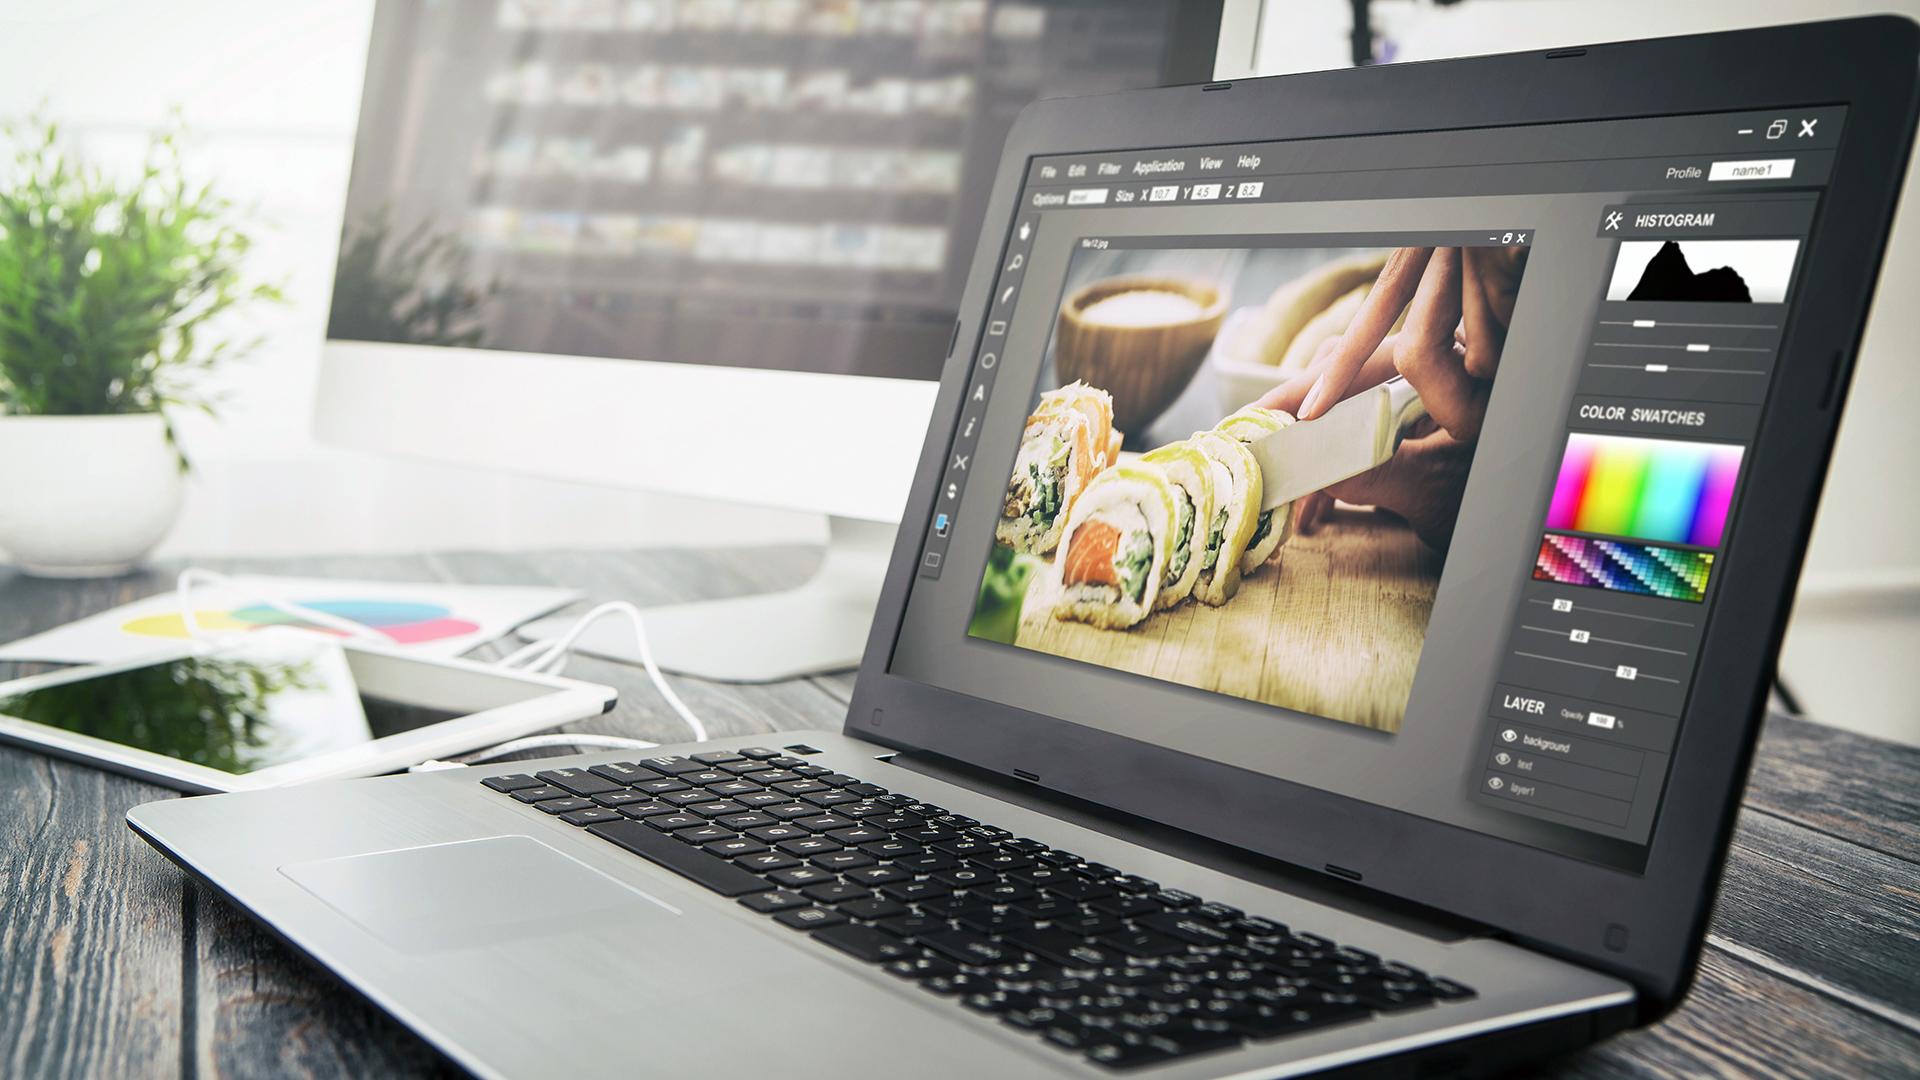 Digital photo editing software